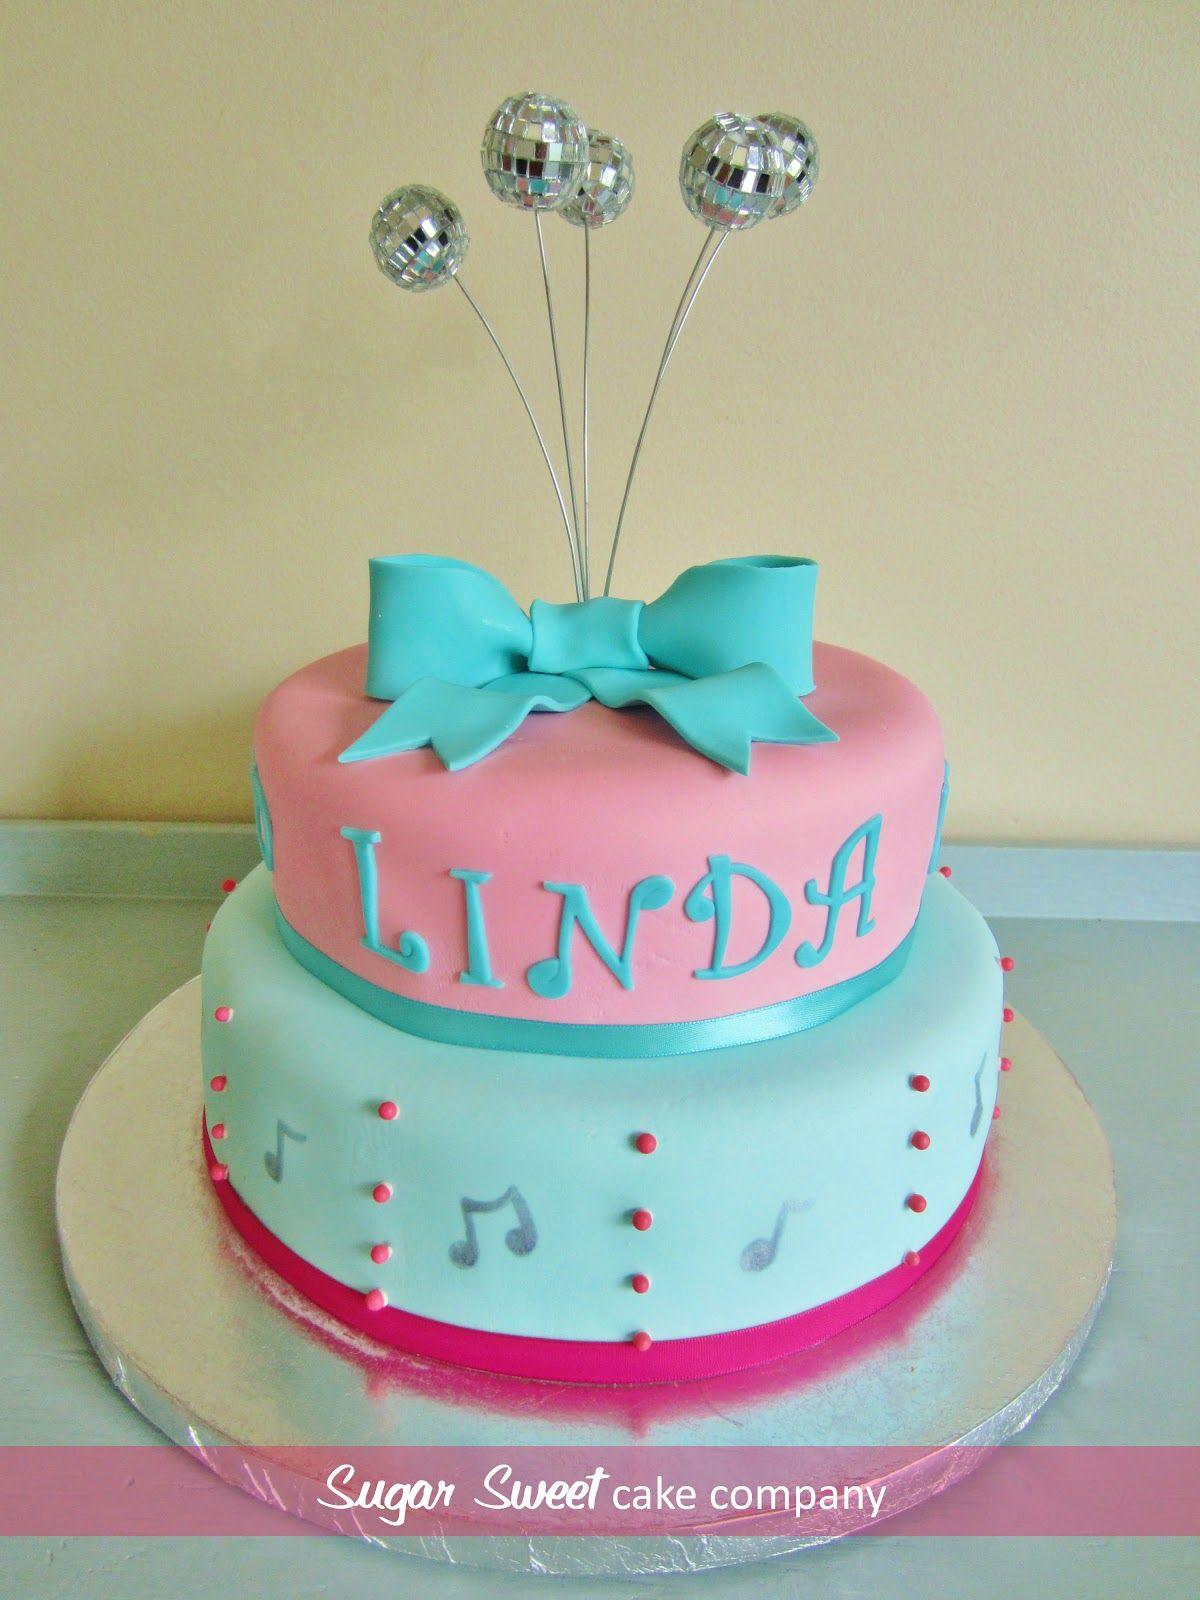 Wondrous Sugar Sweet Cake Company Cake Dance Birthday Cake 50Th Funny Birthday Cards Online Aeocydamsfinfo